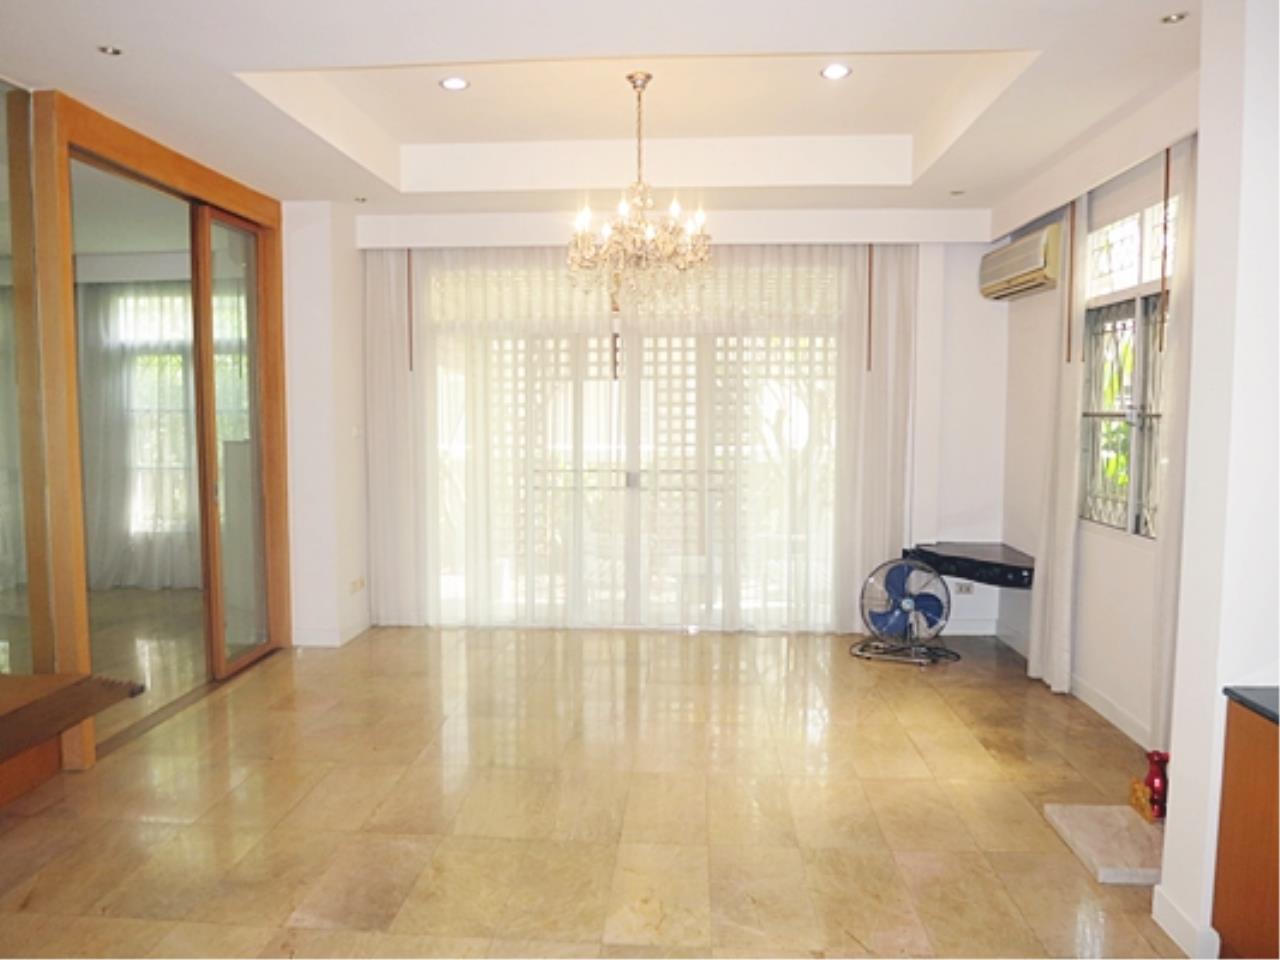 Estate Corner Agency (Samut Prakan) Agency's Single house for sale Ladprao, fully furnished. 2